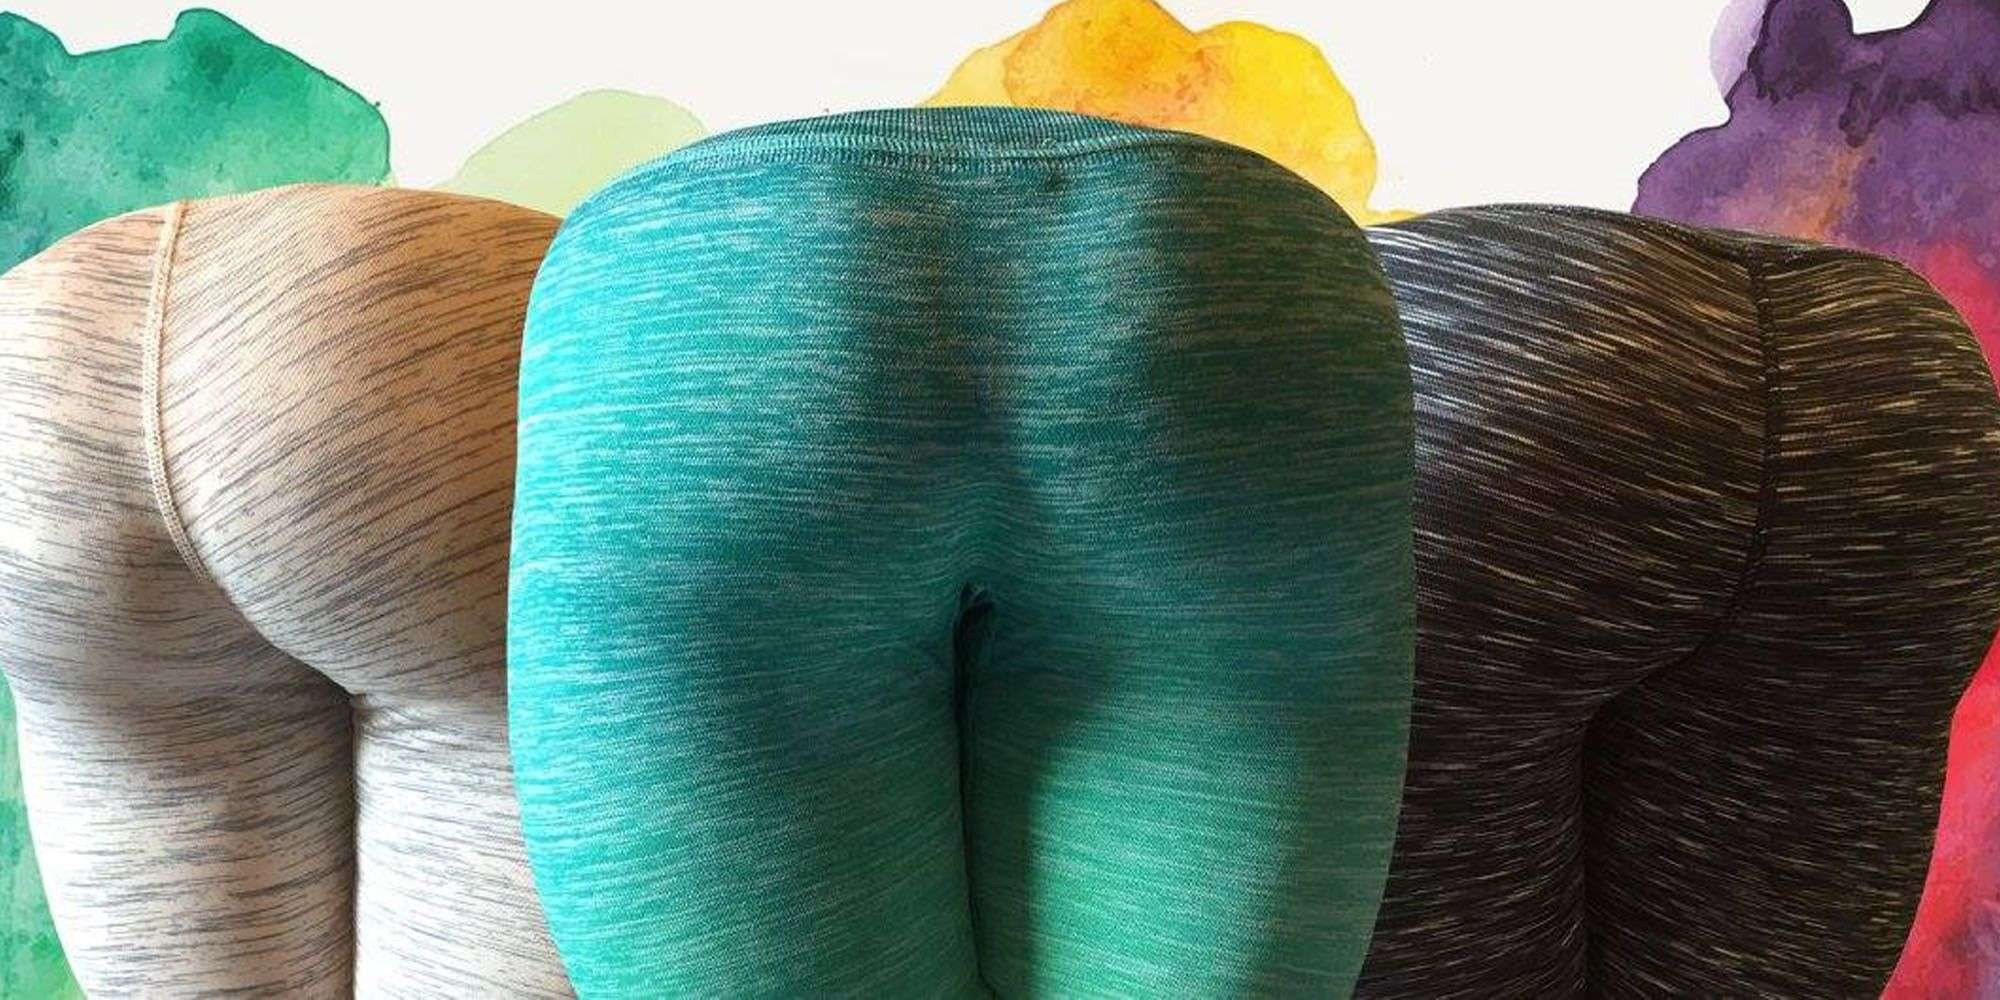 cuscino a forma di culo